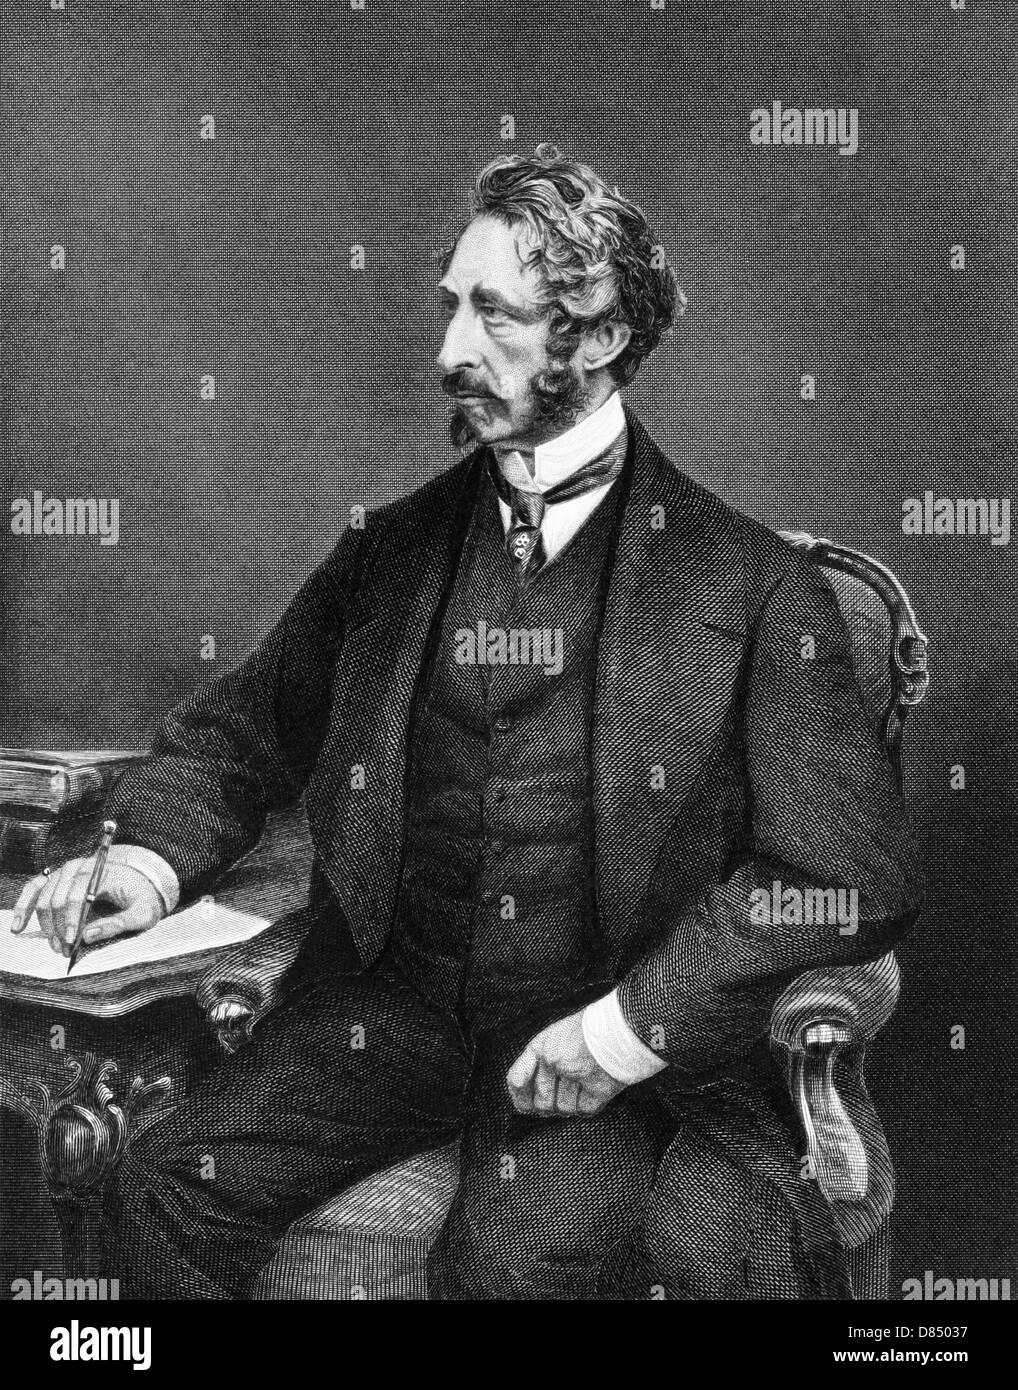 Edward Bulwer-Lytton, 1st Baron Lytton (1803-1873) on engraving from 1873. English novelist, poet, playwright and Stock Photo